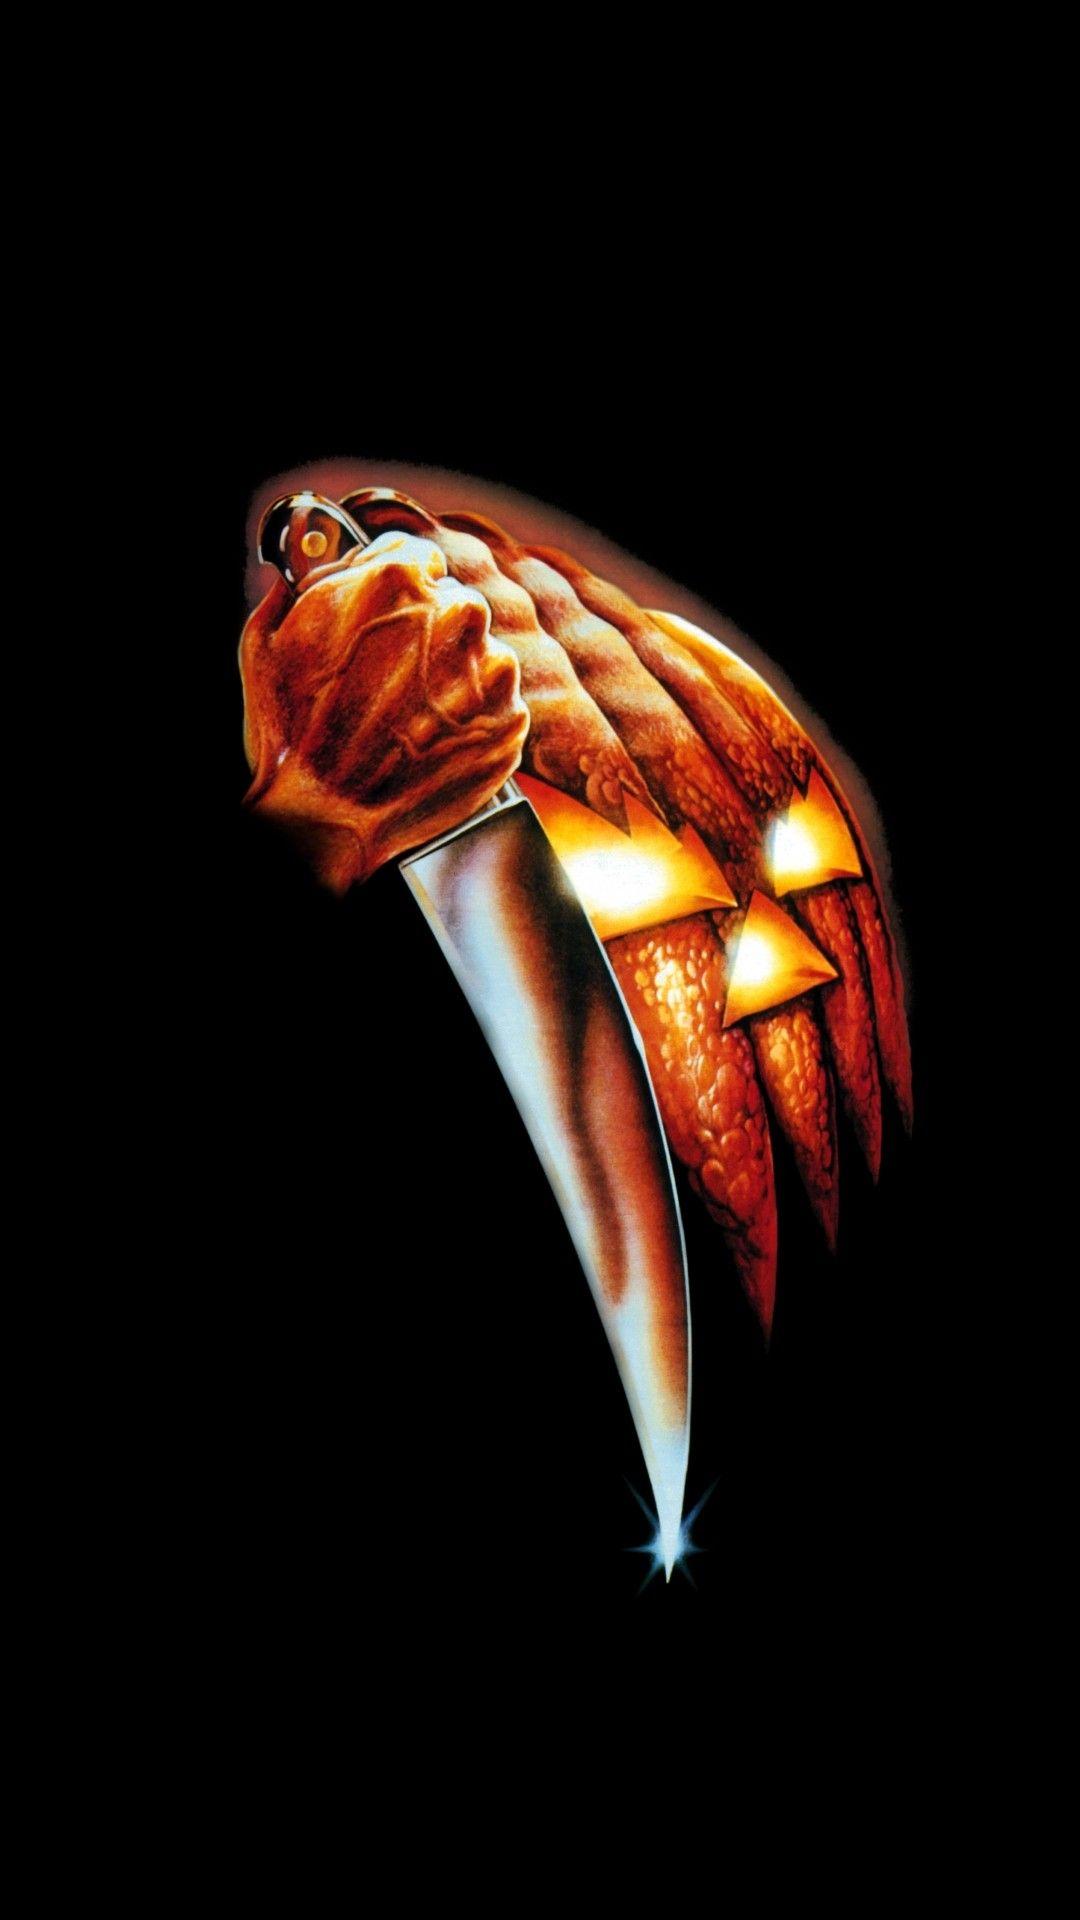 Horror Movies Wallpaper Iphone Halloween 1978 109815